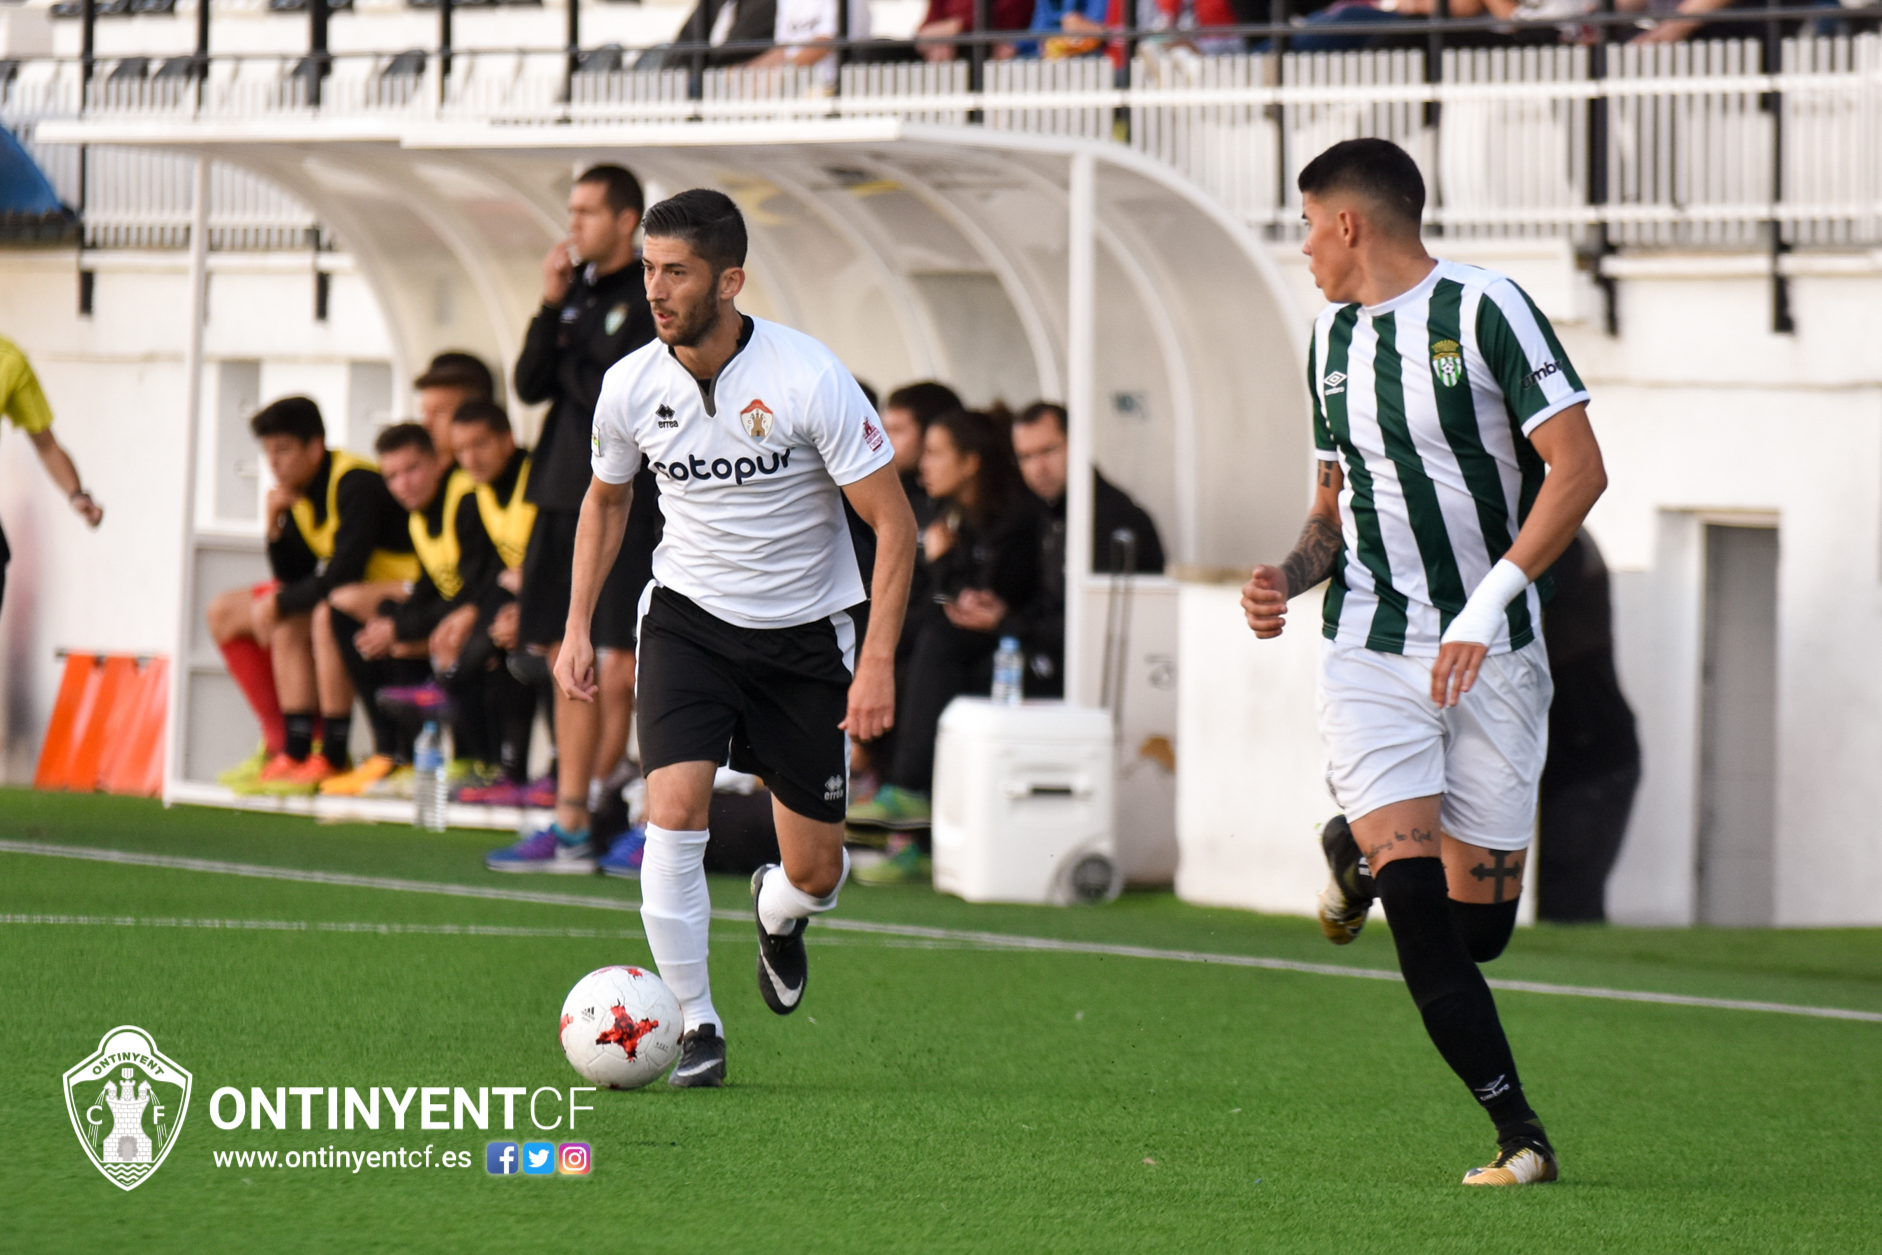 J13 Ontinyent CF (1) - (0) CF Peralada - Girona B